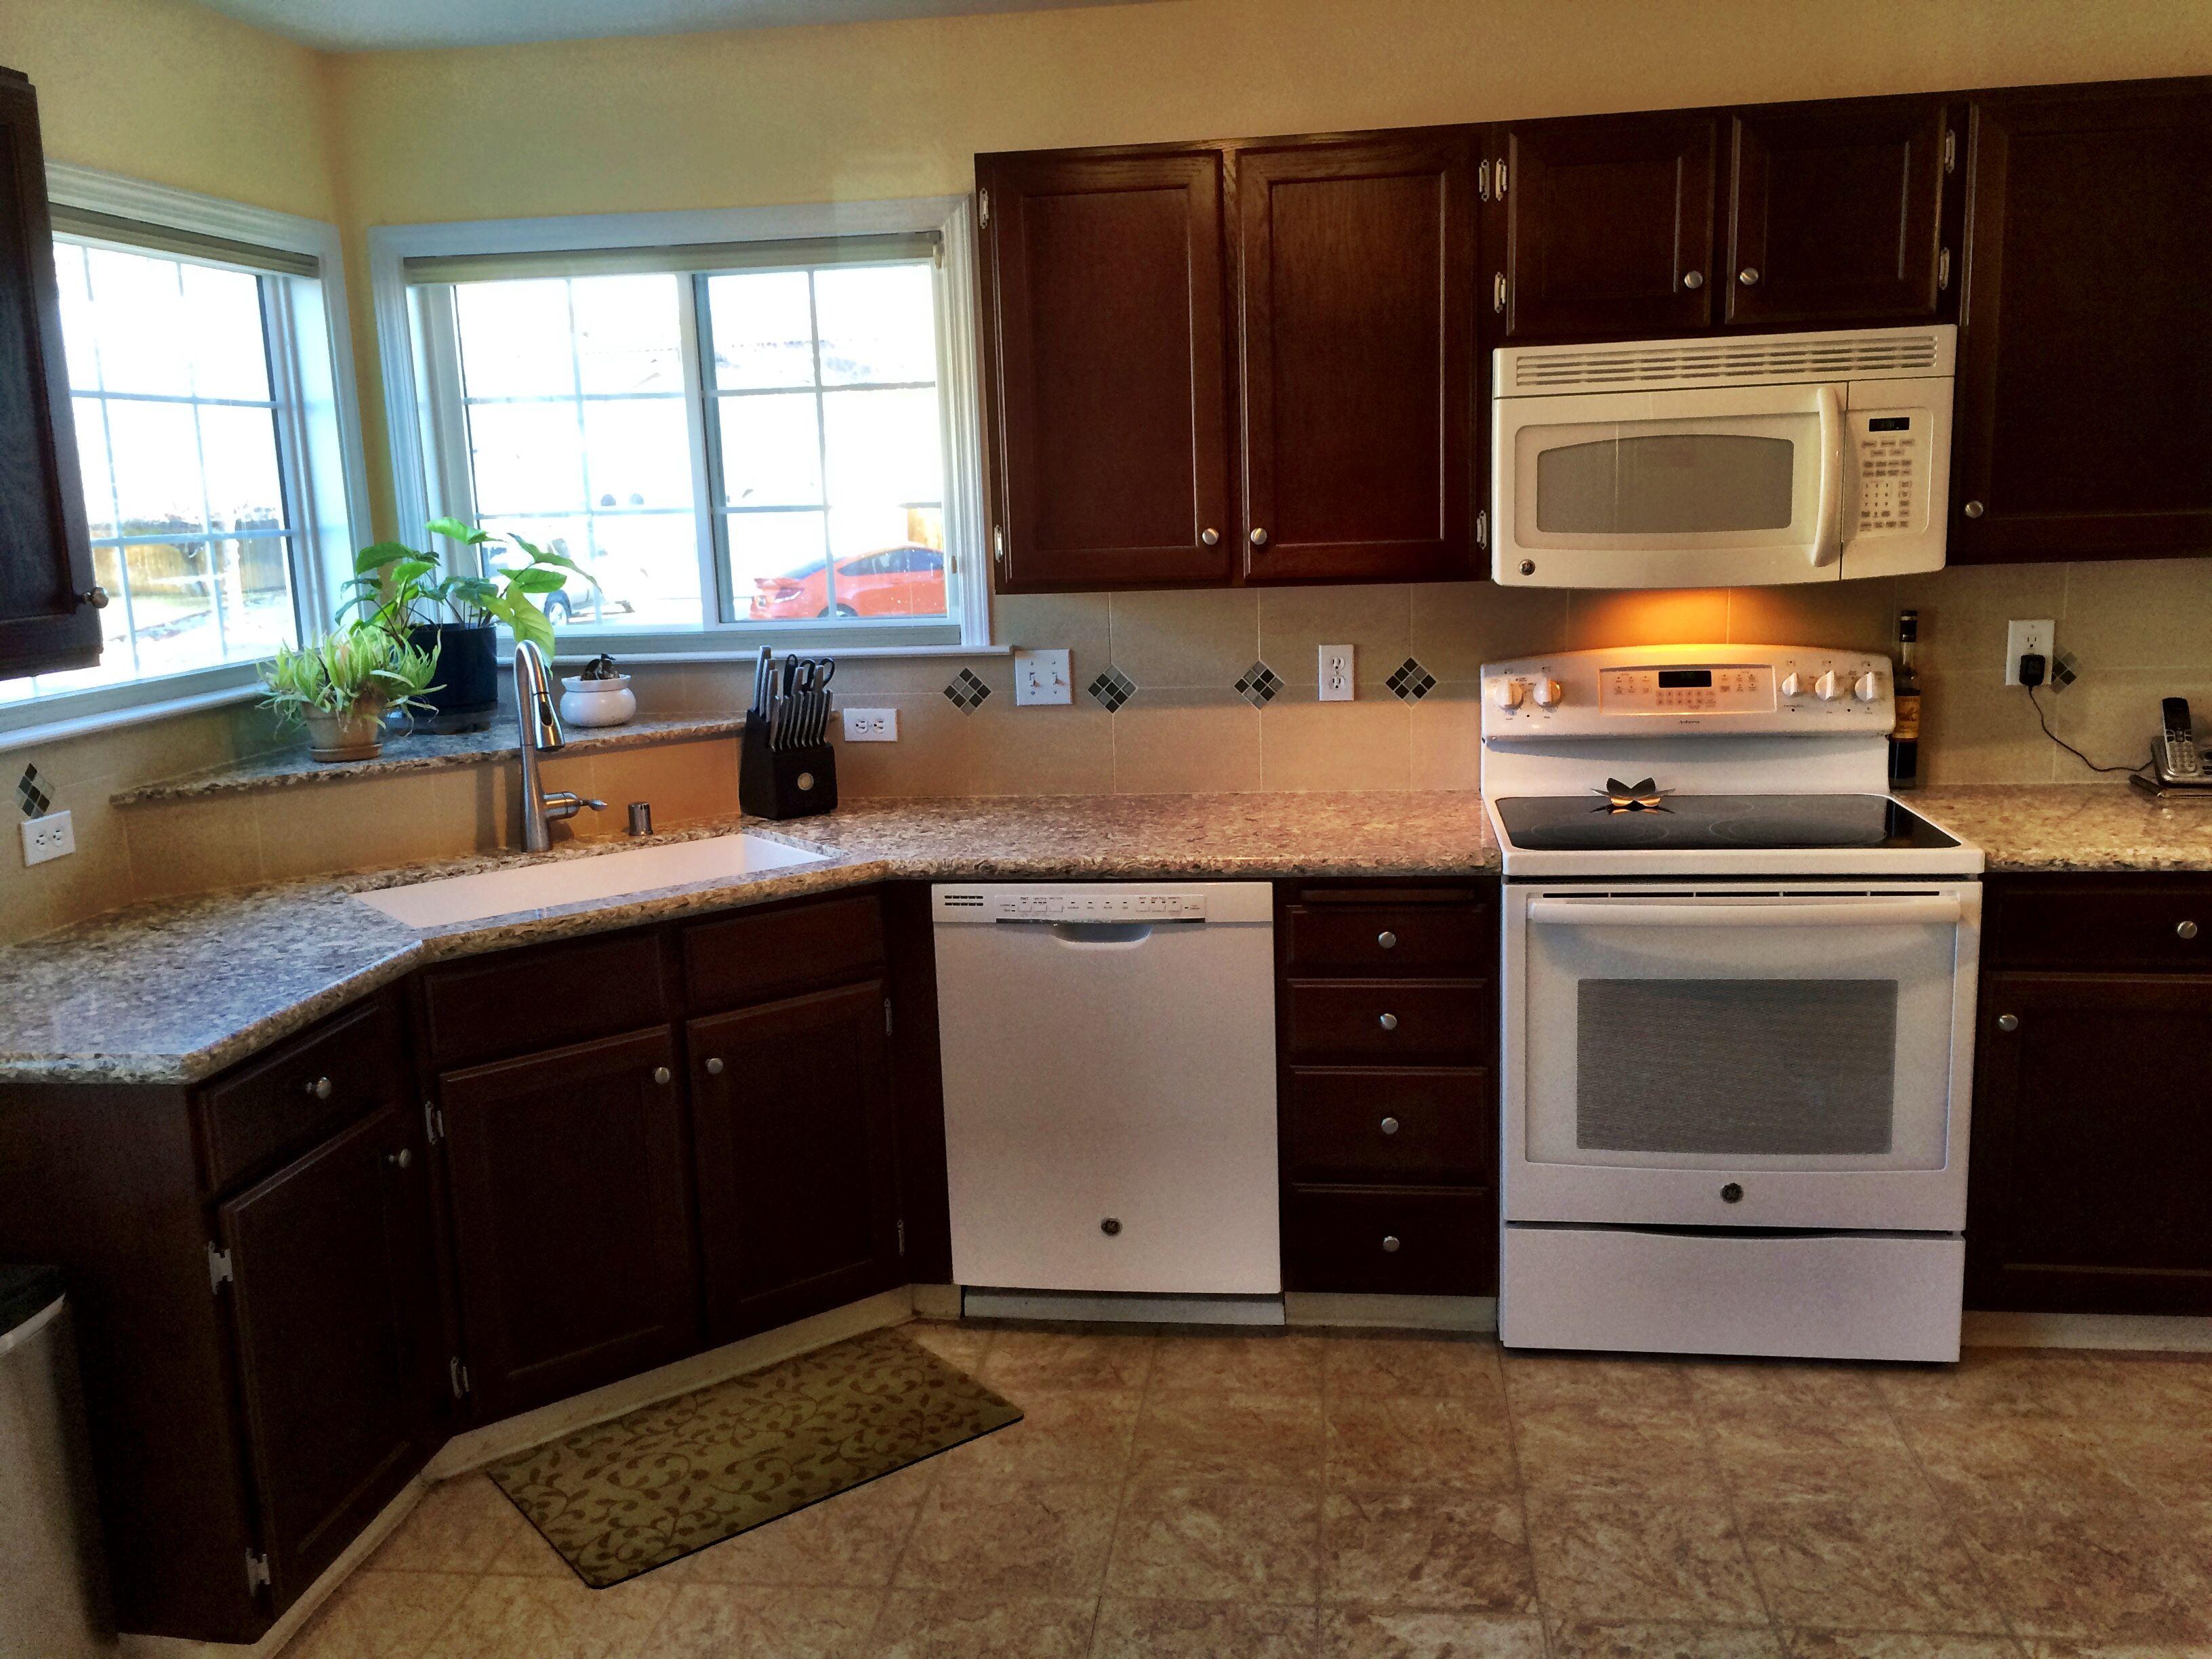 #reno #sparks #realestate #setup | Kitchen cabinets, Home ...